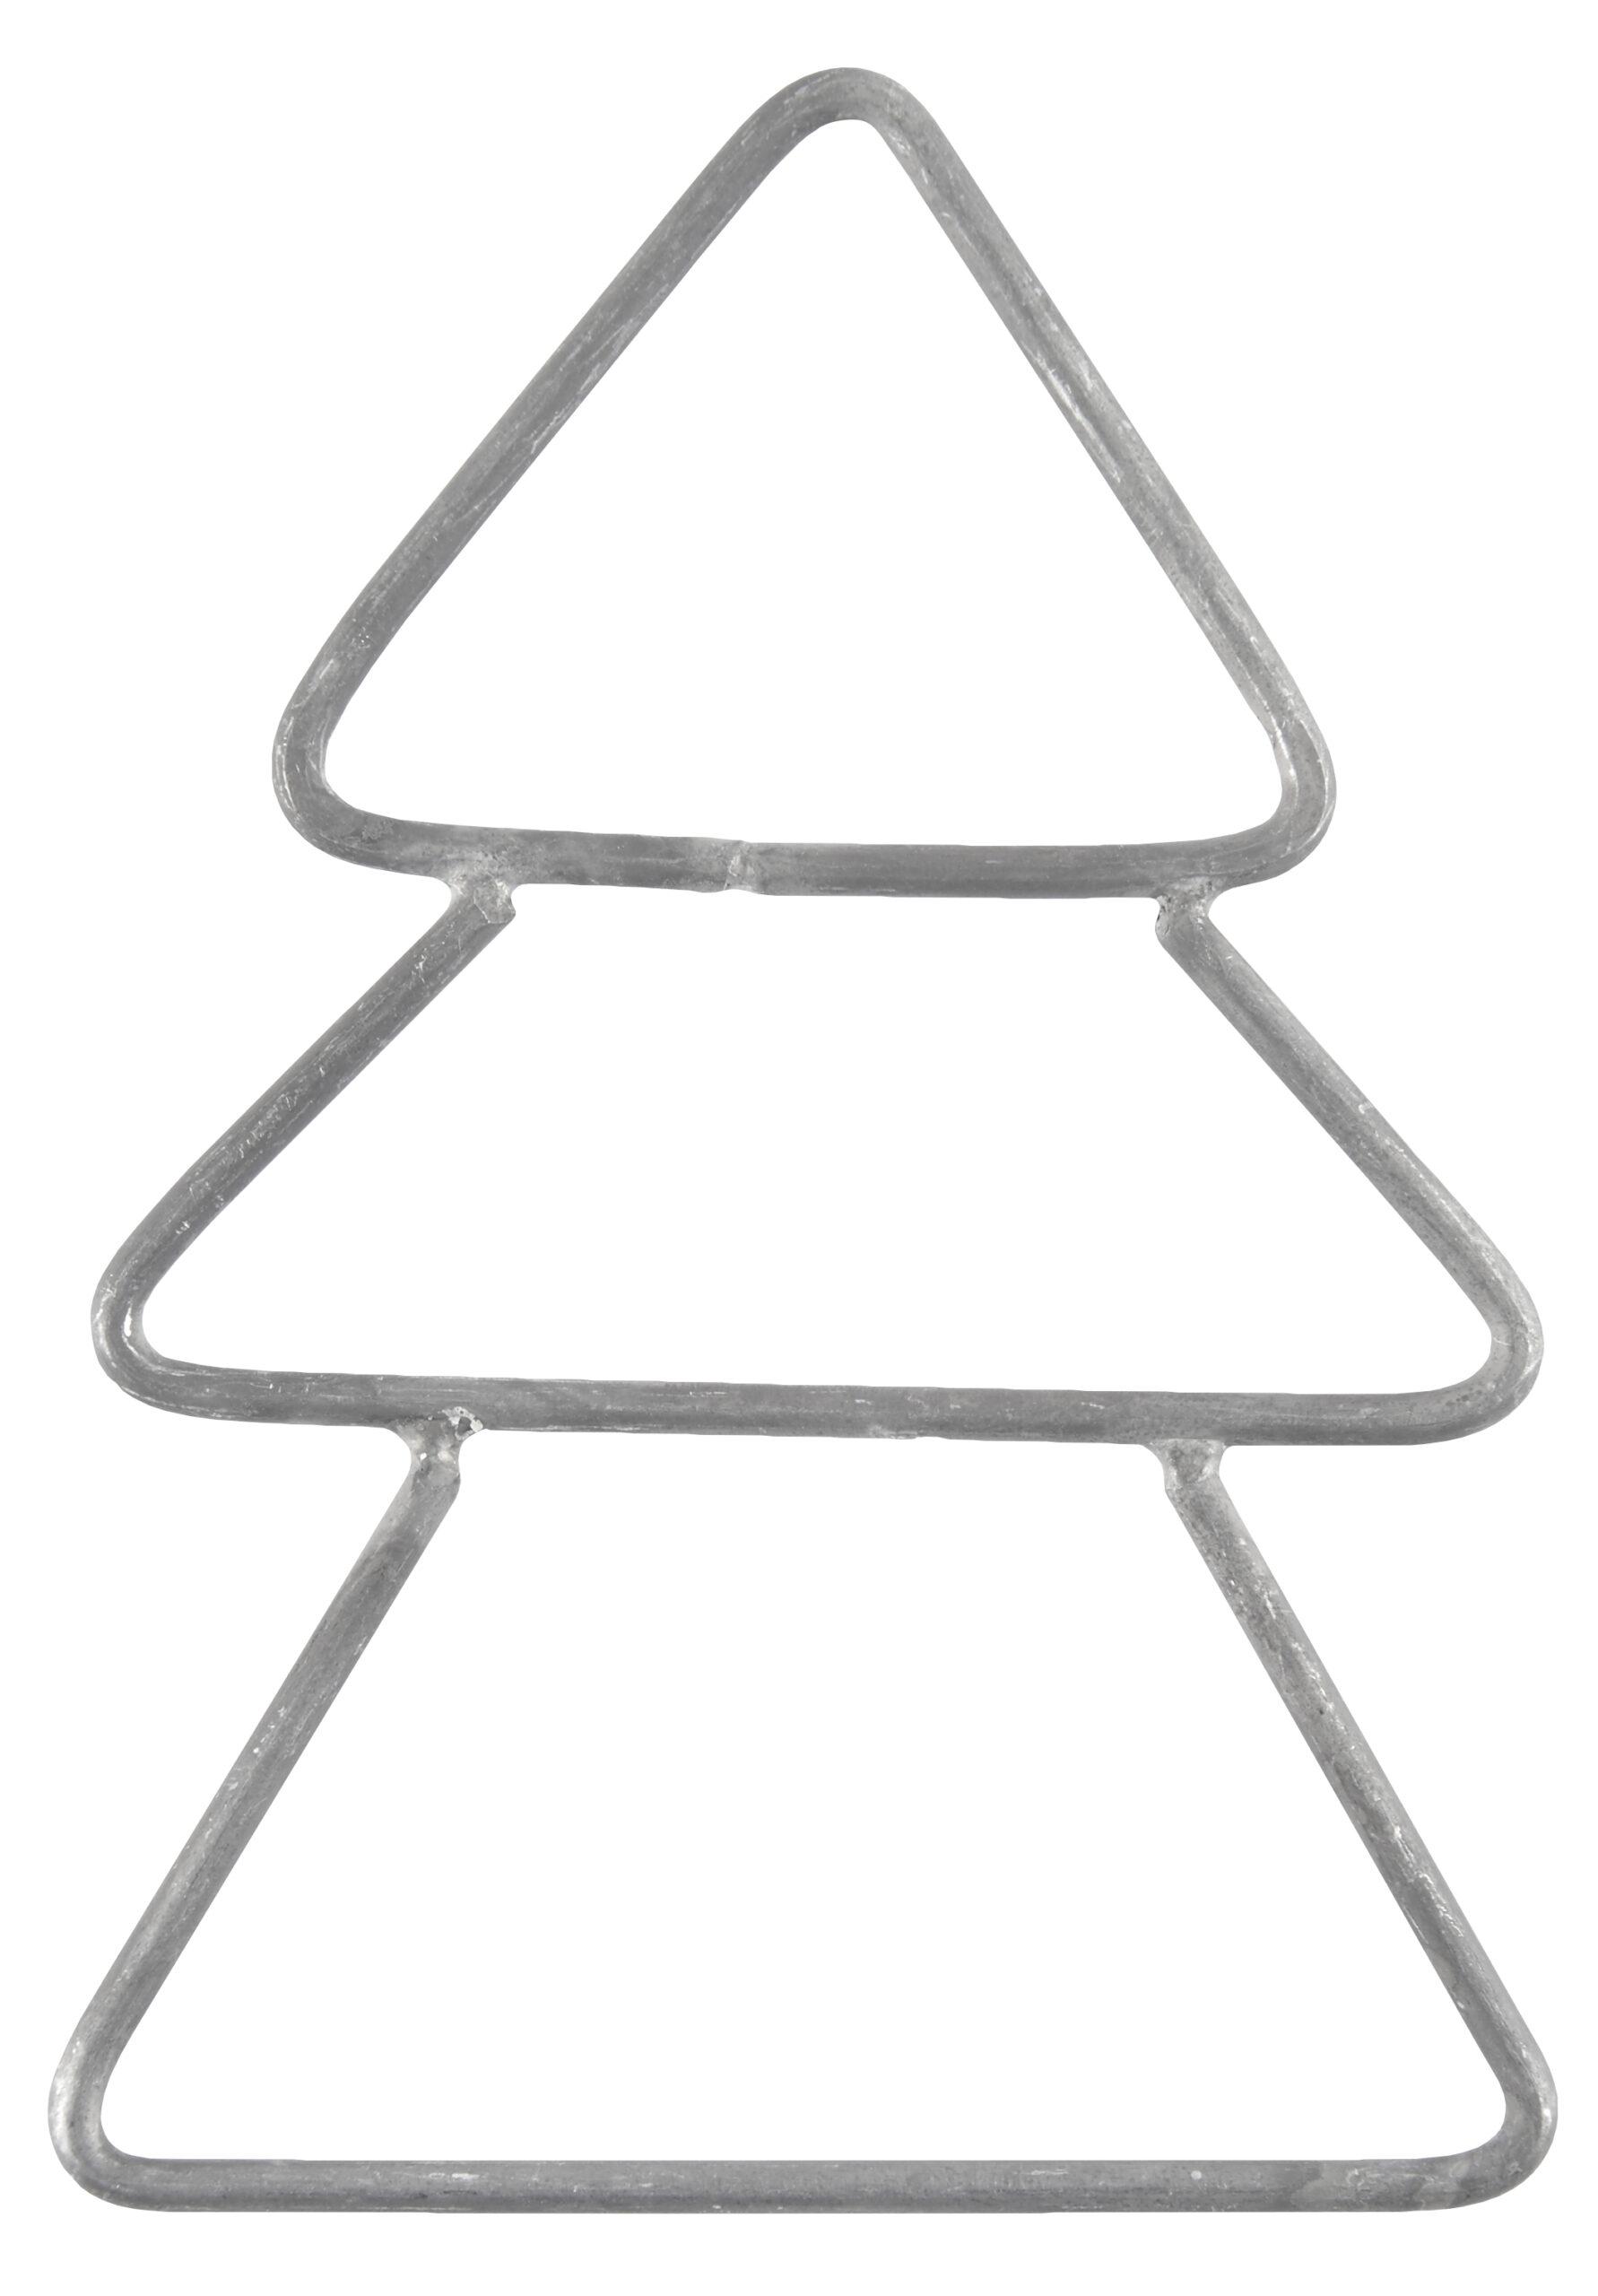 Juletræ enkelt stor